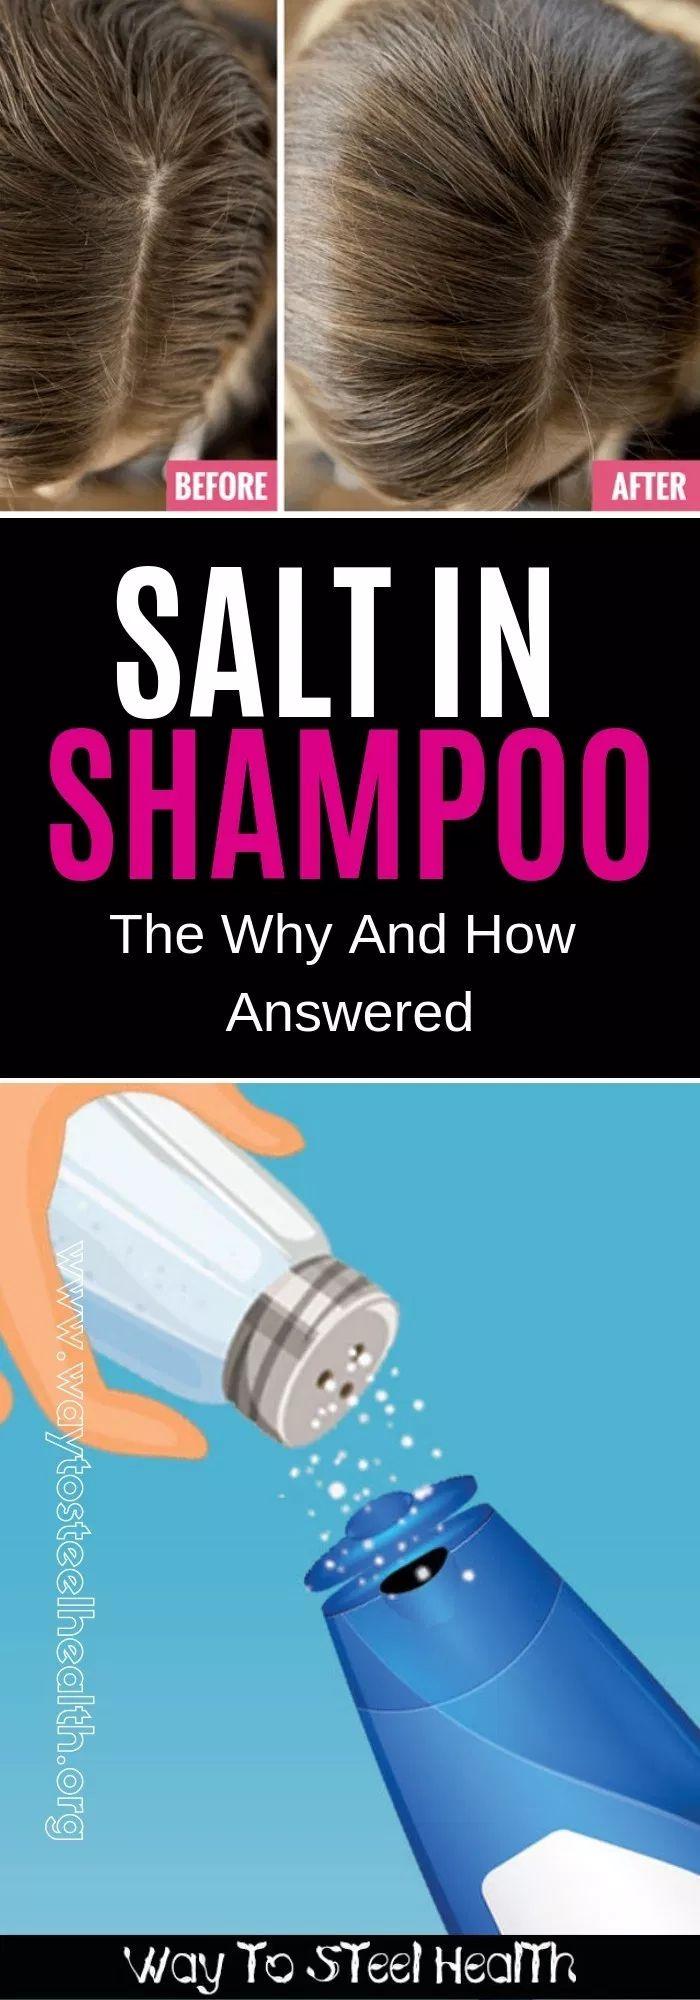 Salt in Shampoo The Why and How Answered Shampoo